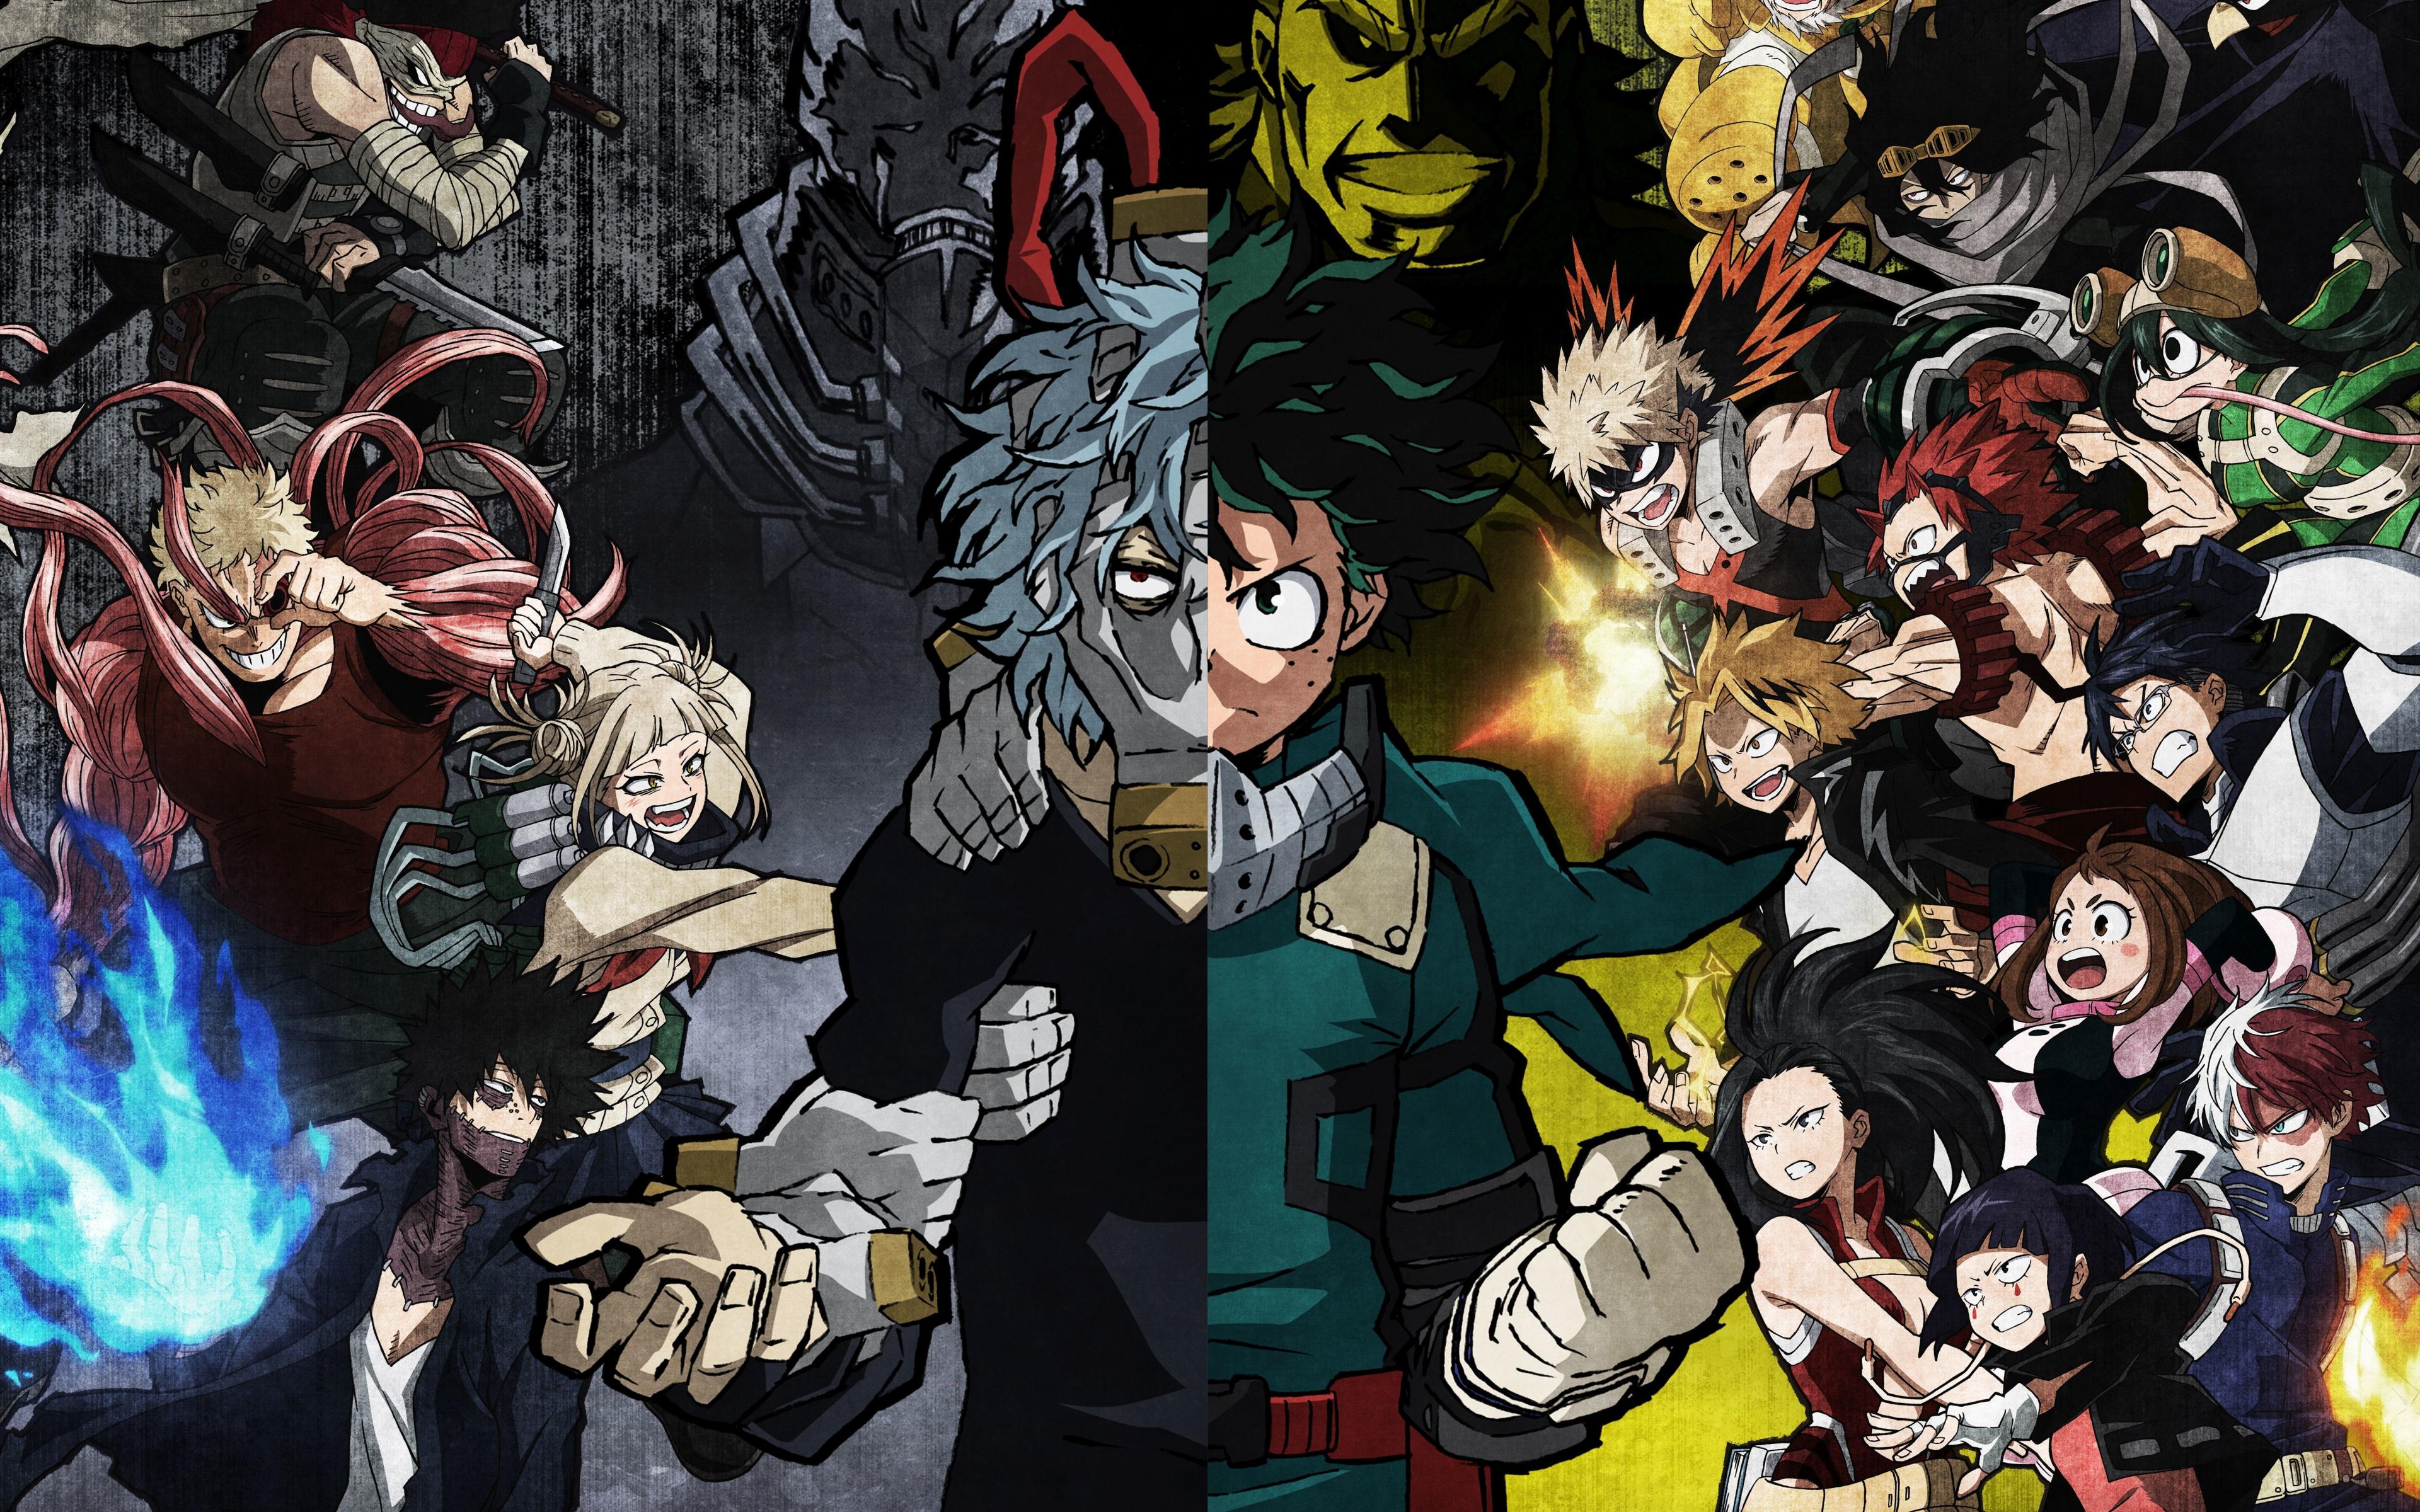 Download 3840x2400 Wallpaper My Hero Academia Izuku Face Off